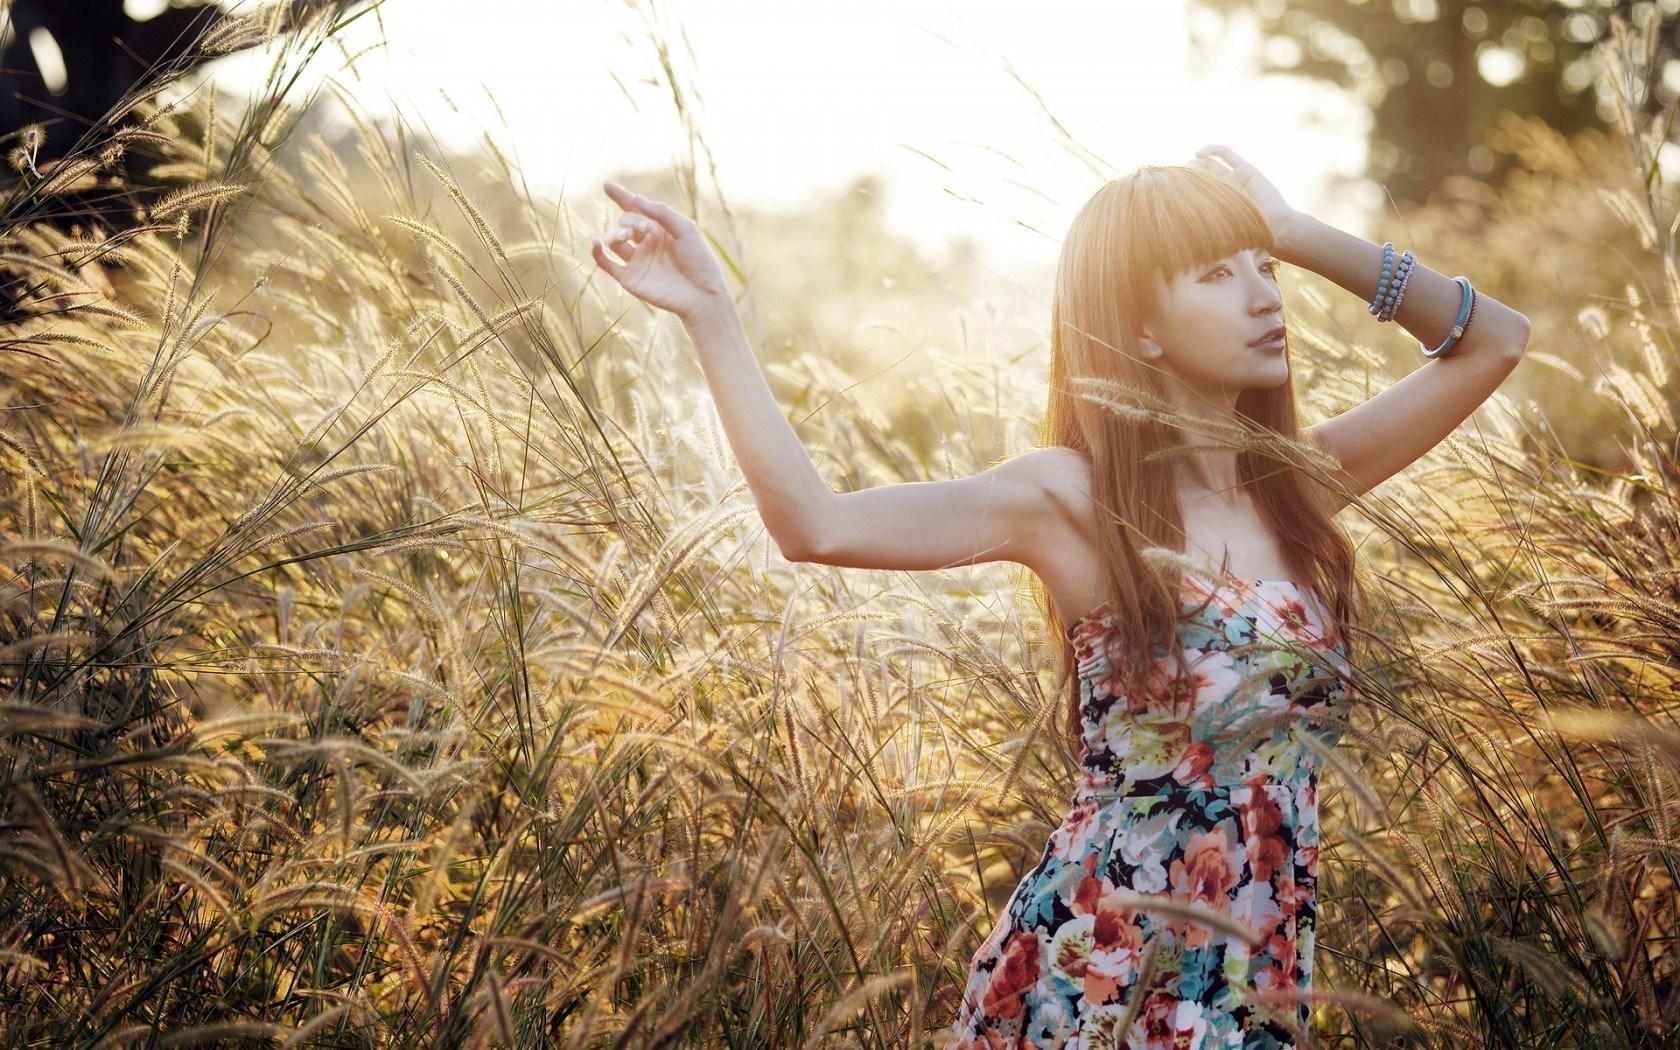 girl-asian-mood-field-nature-hd-wallpaper